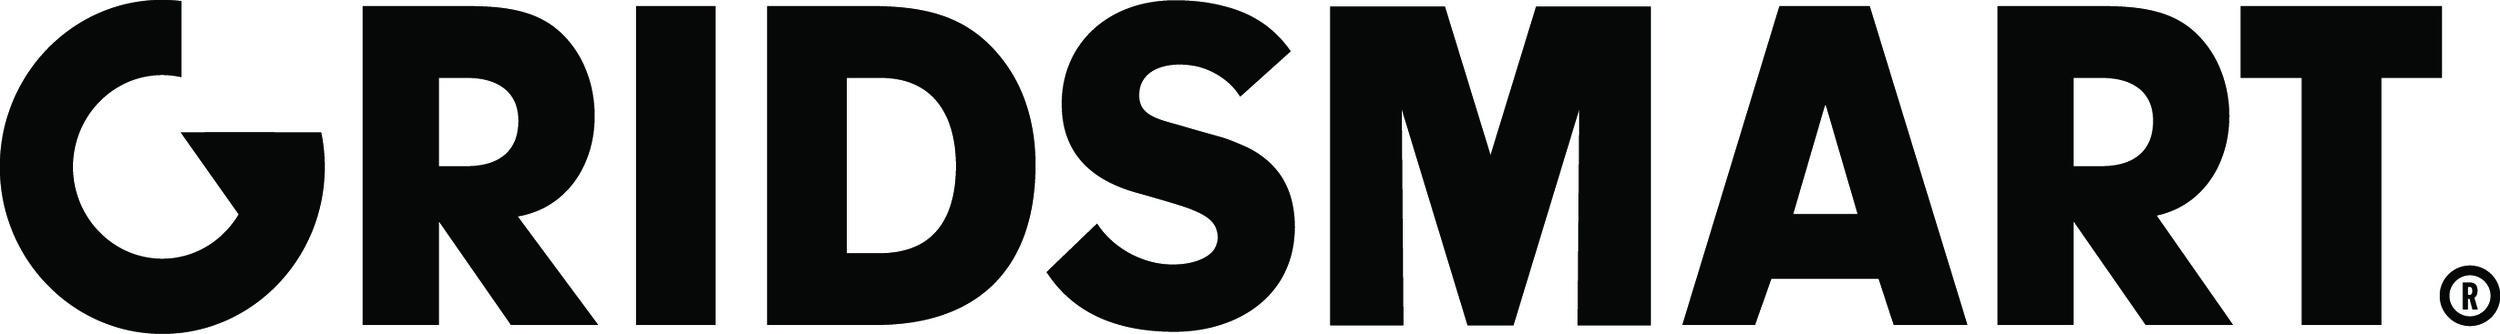 GridSmart_Logotype_CYMK.jpg